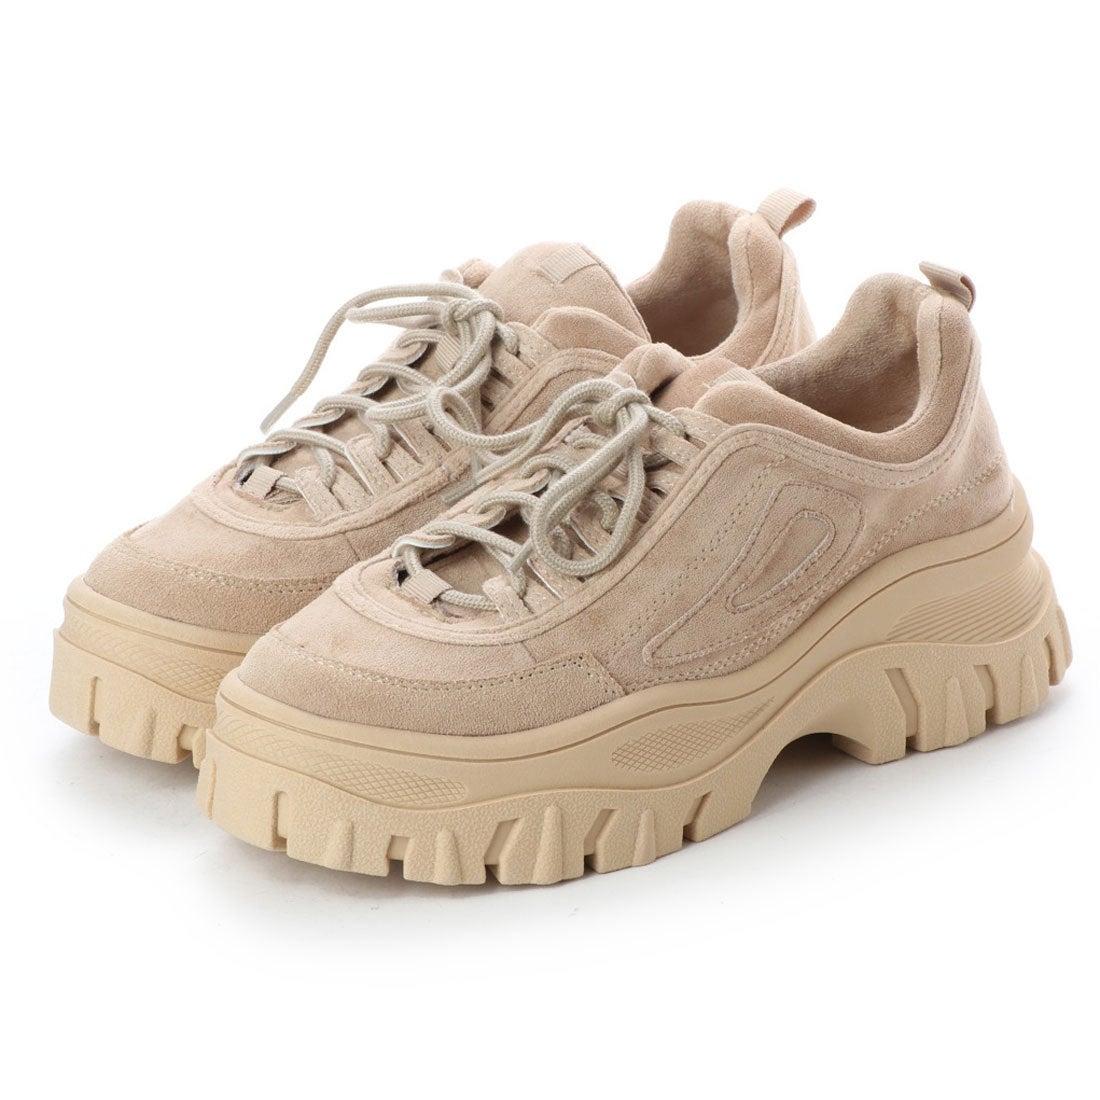 EVOL】 Mathilda 4色展開厚底スニーカー (ベージュ),靴